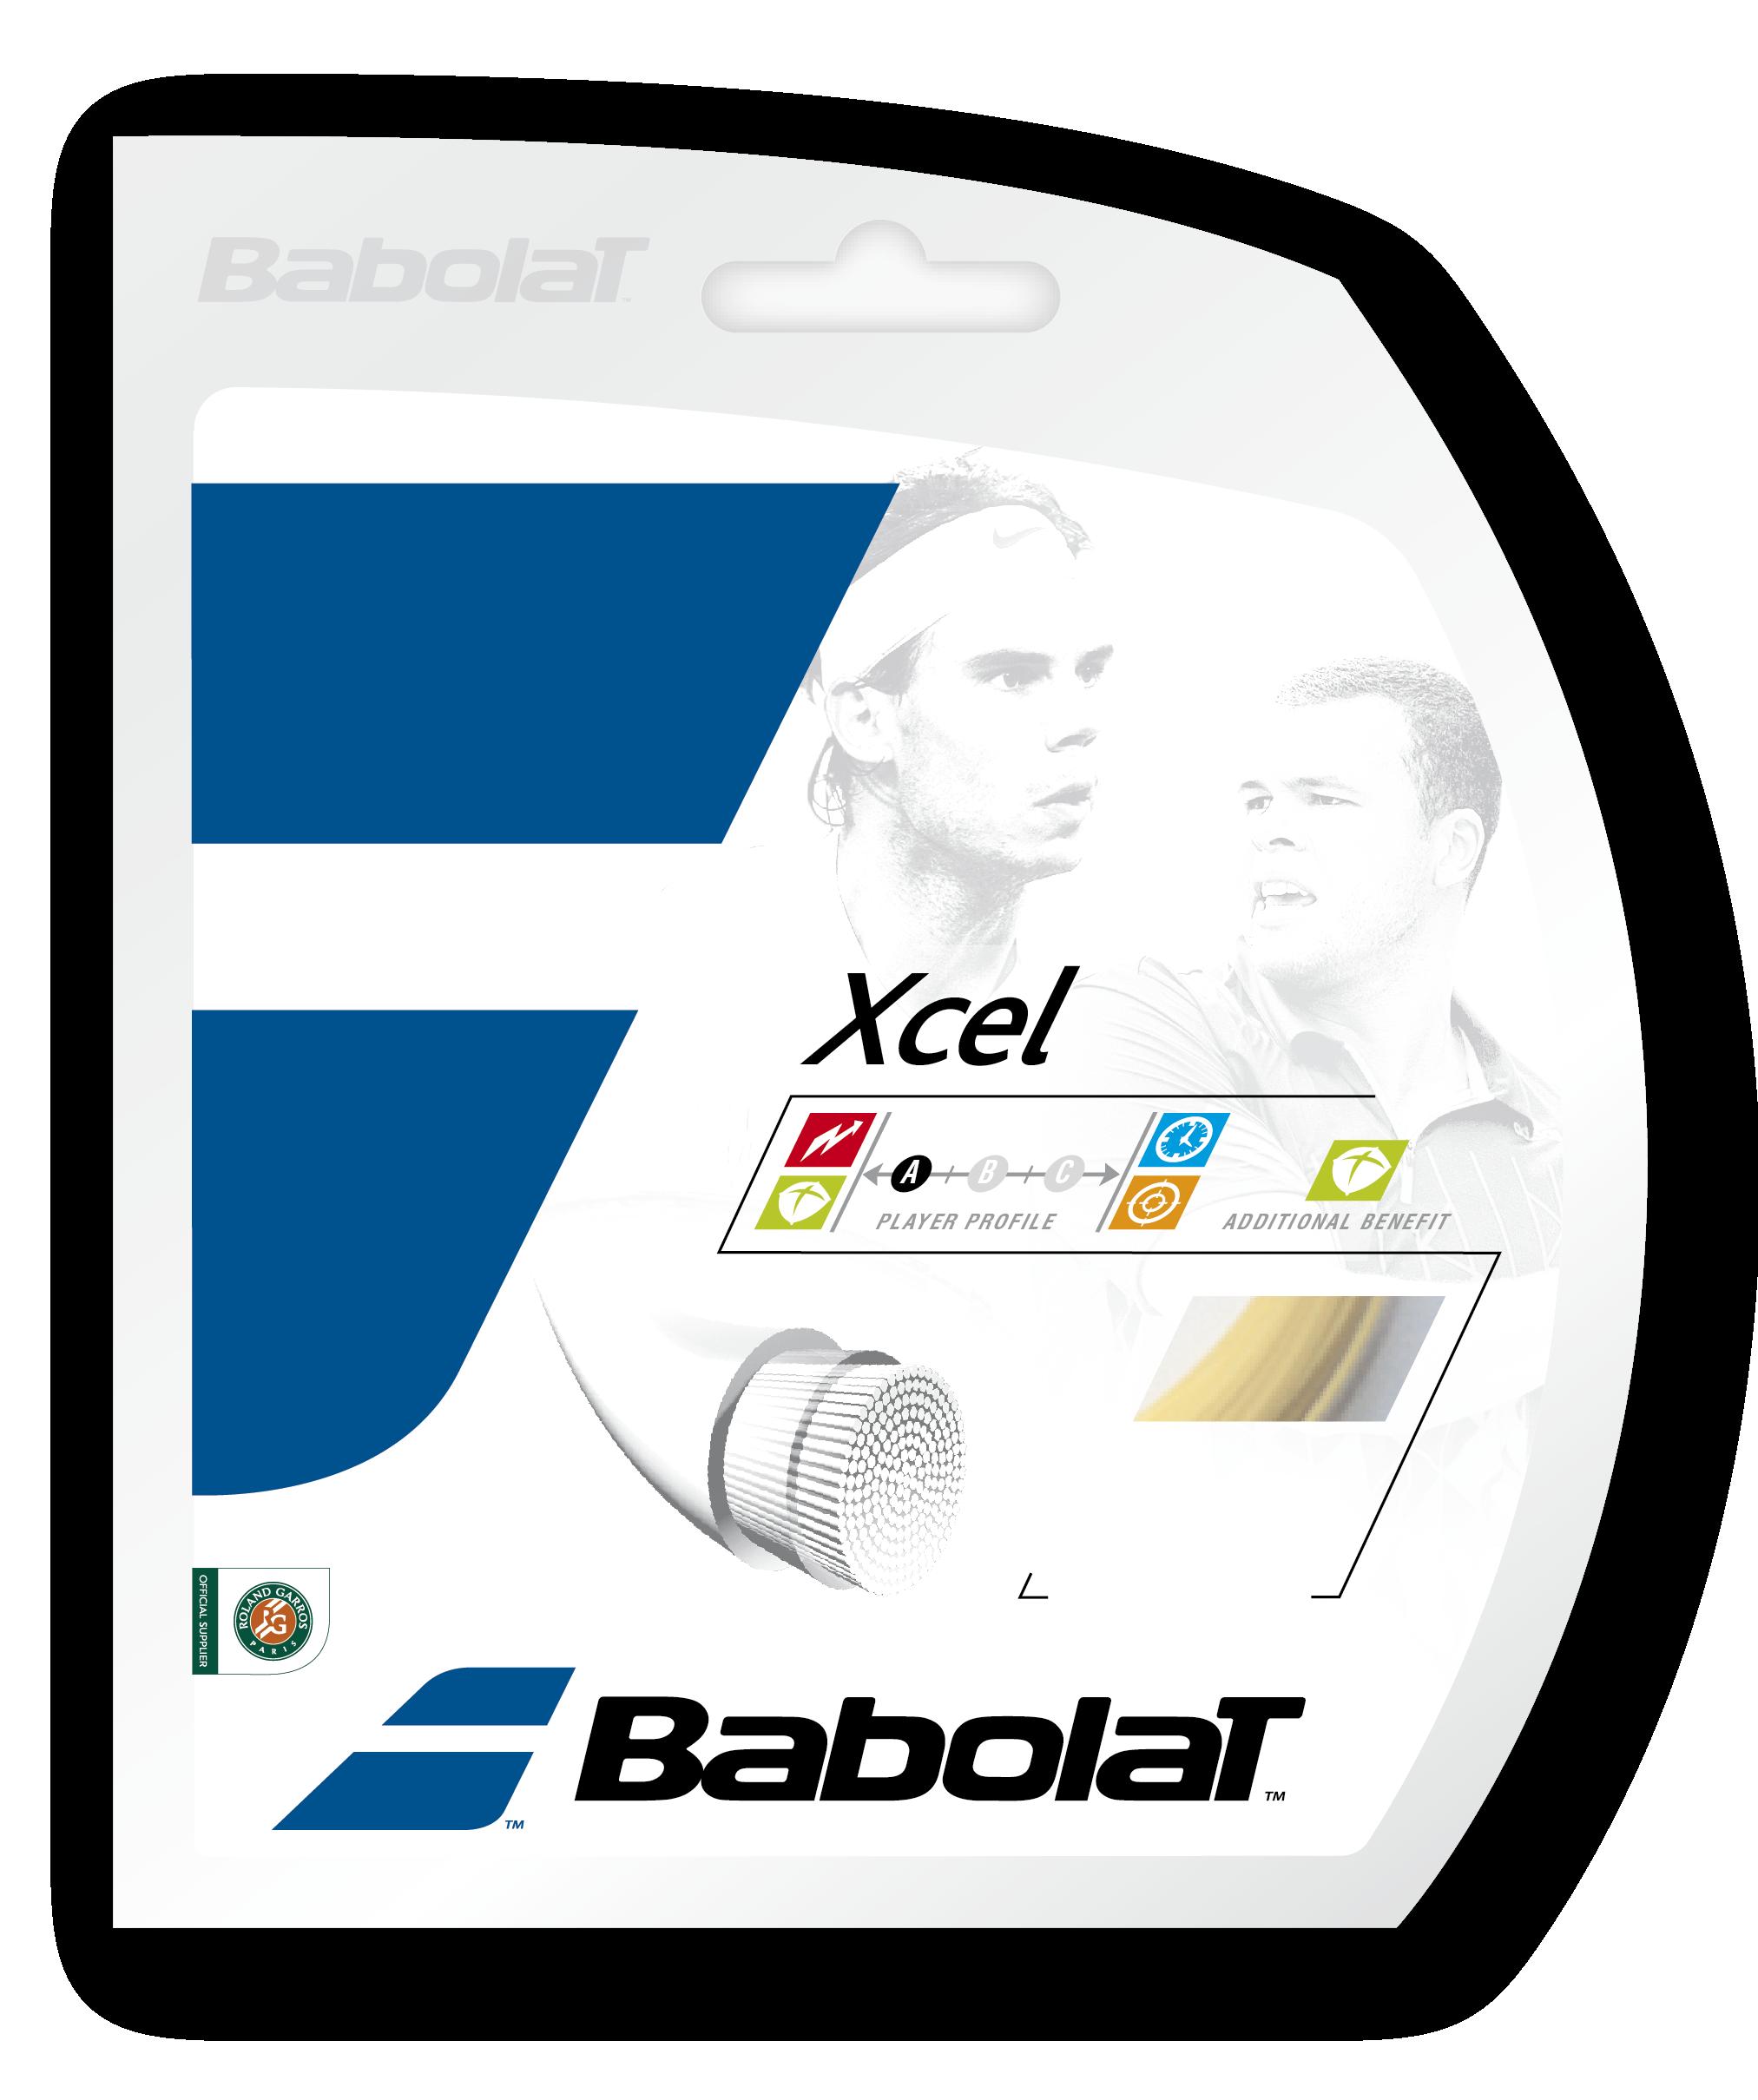 Babolat Xcel (multifilament)